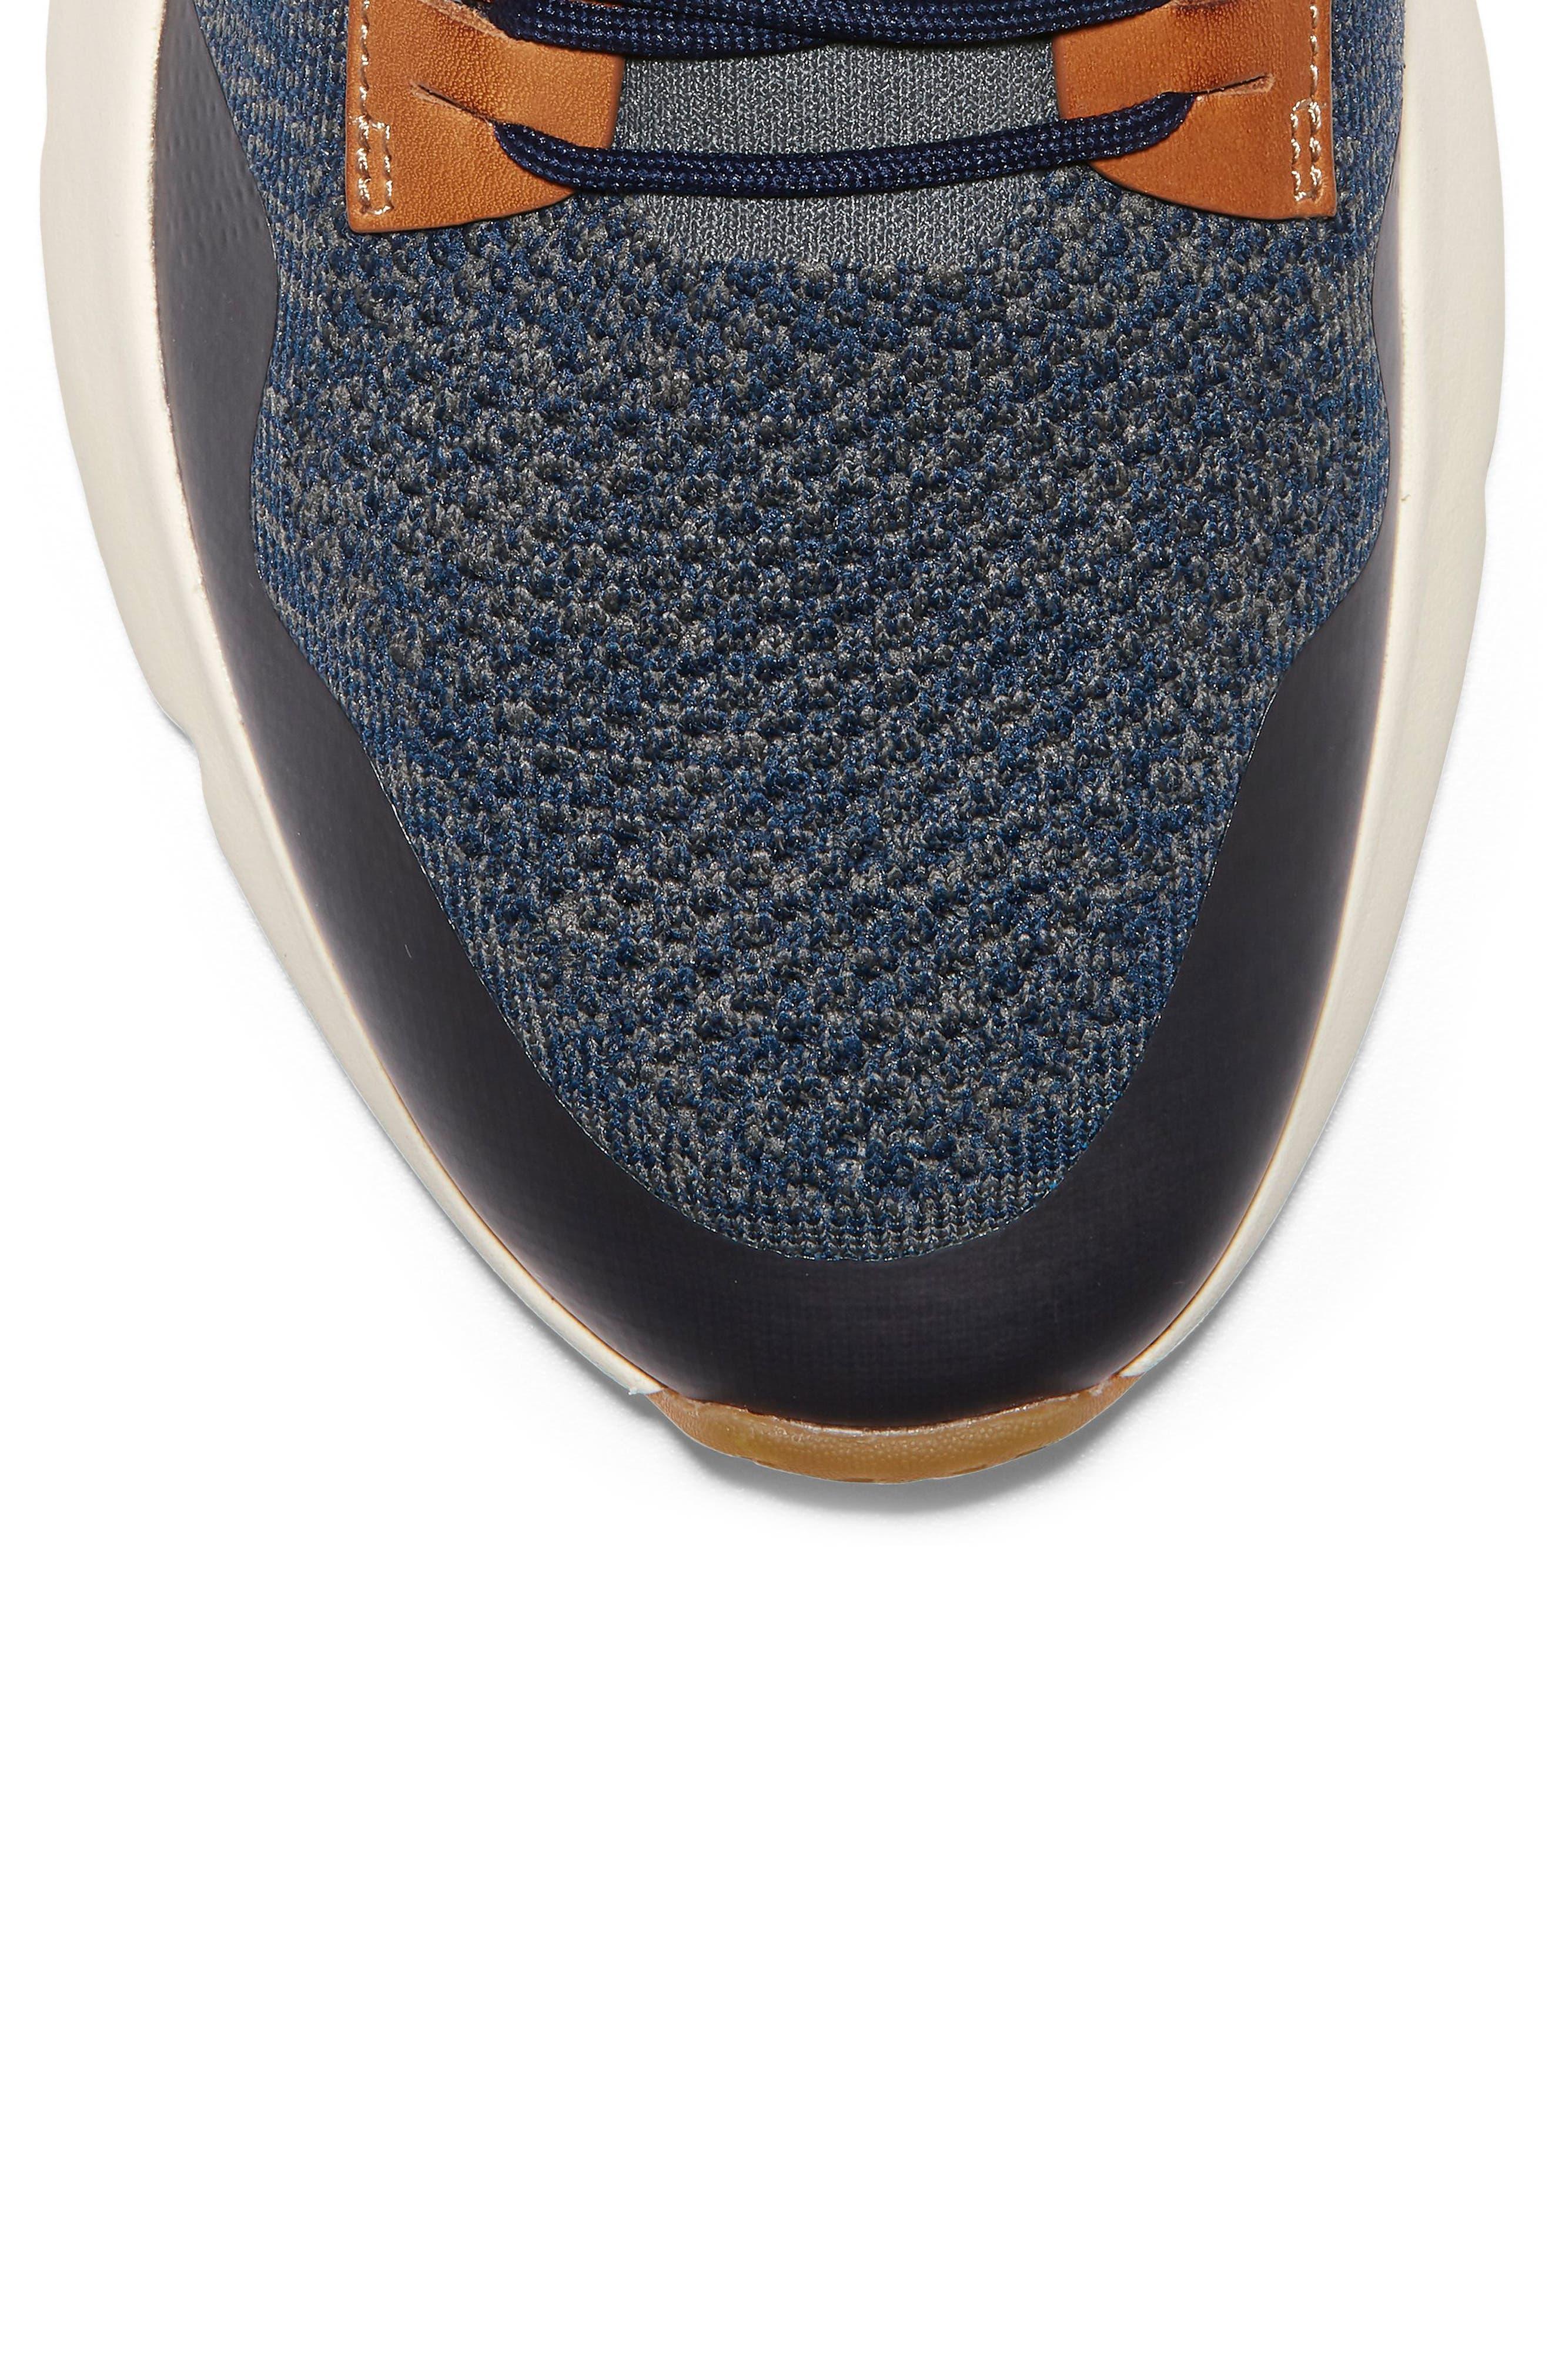 ZeroGrand All-Day Trainer Sneaker,                             Alternate thumbnail 7, color,                             MARINE BLUE/ TAN KNIT